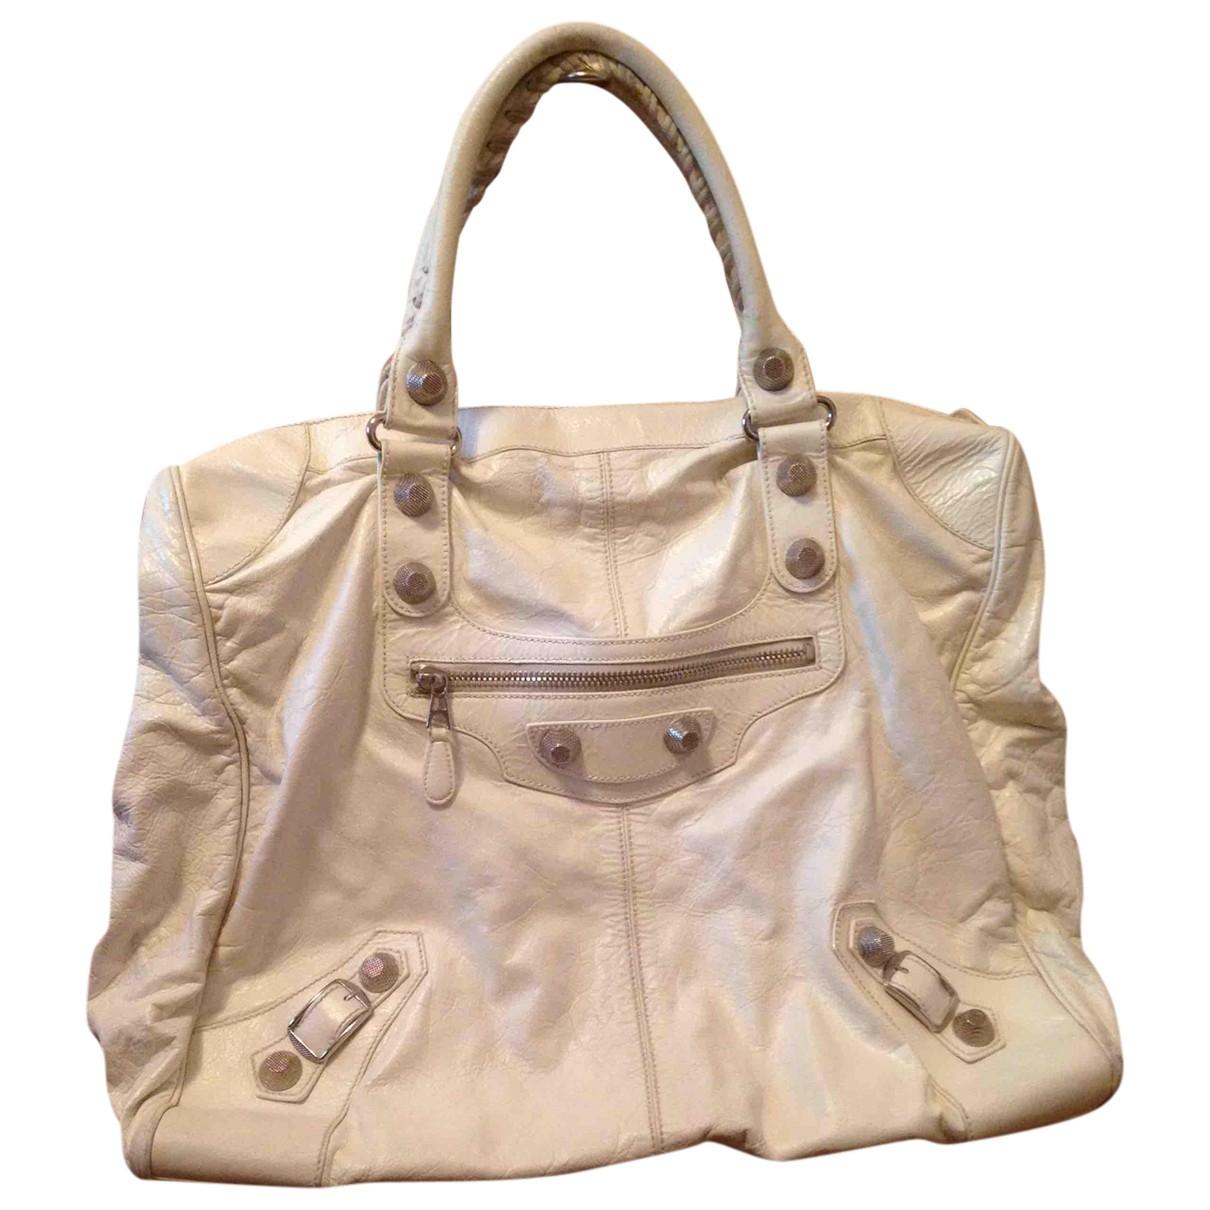 Balenciaga - Sac a main Velo pour femme en cuir - blanc